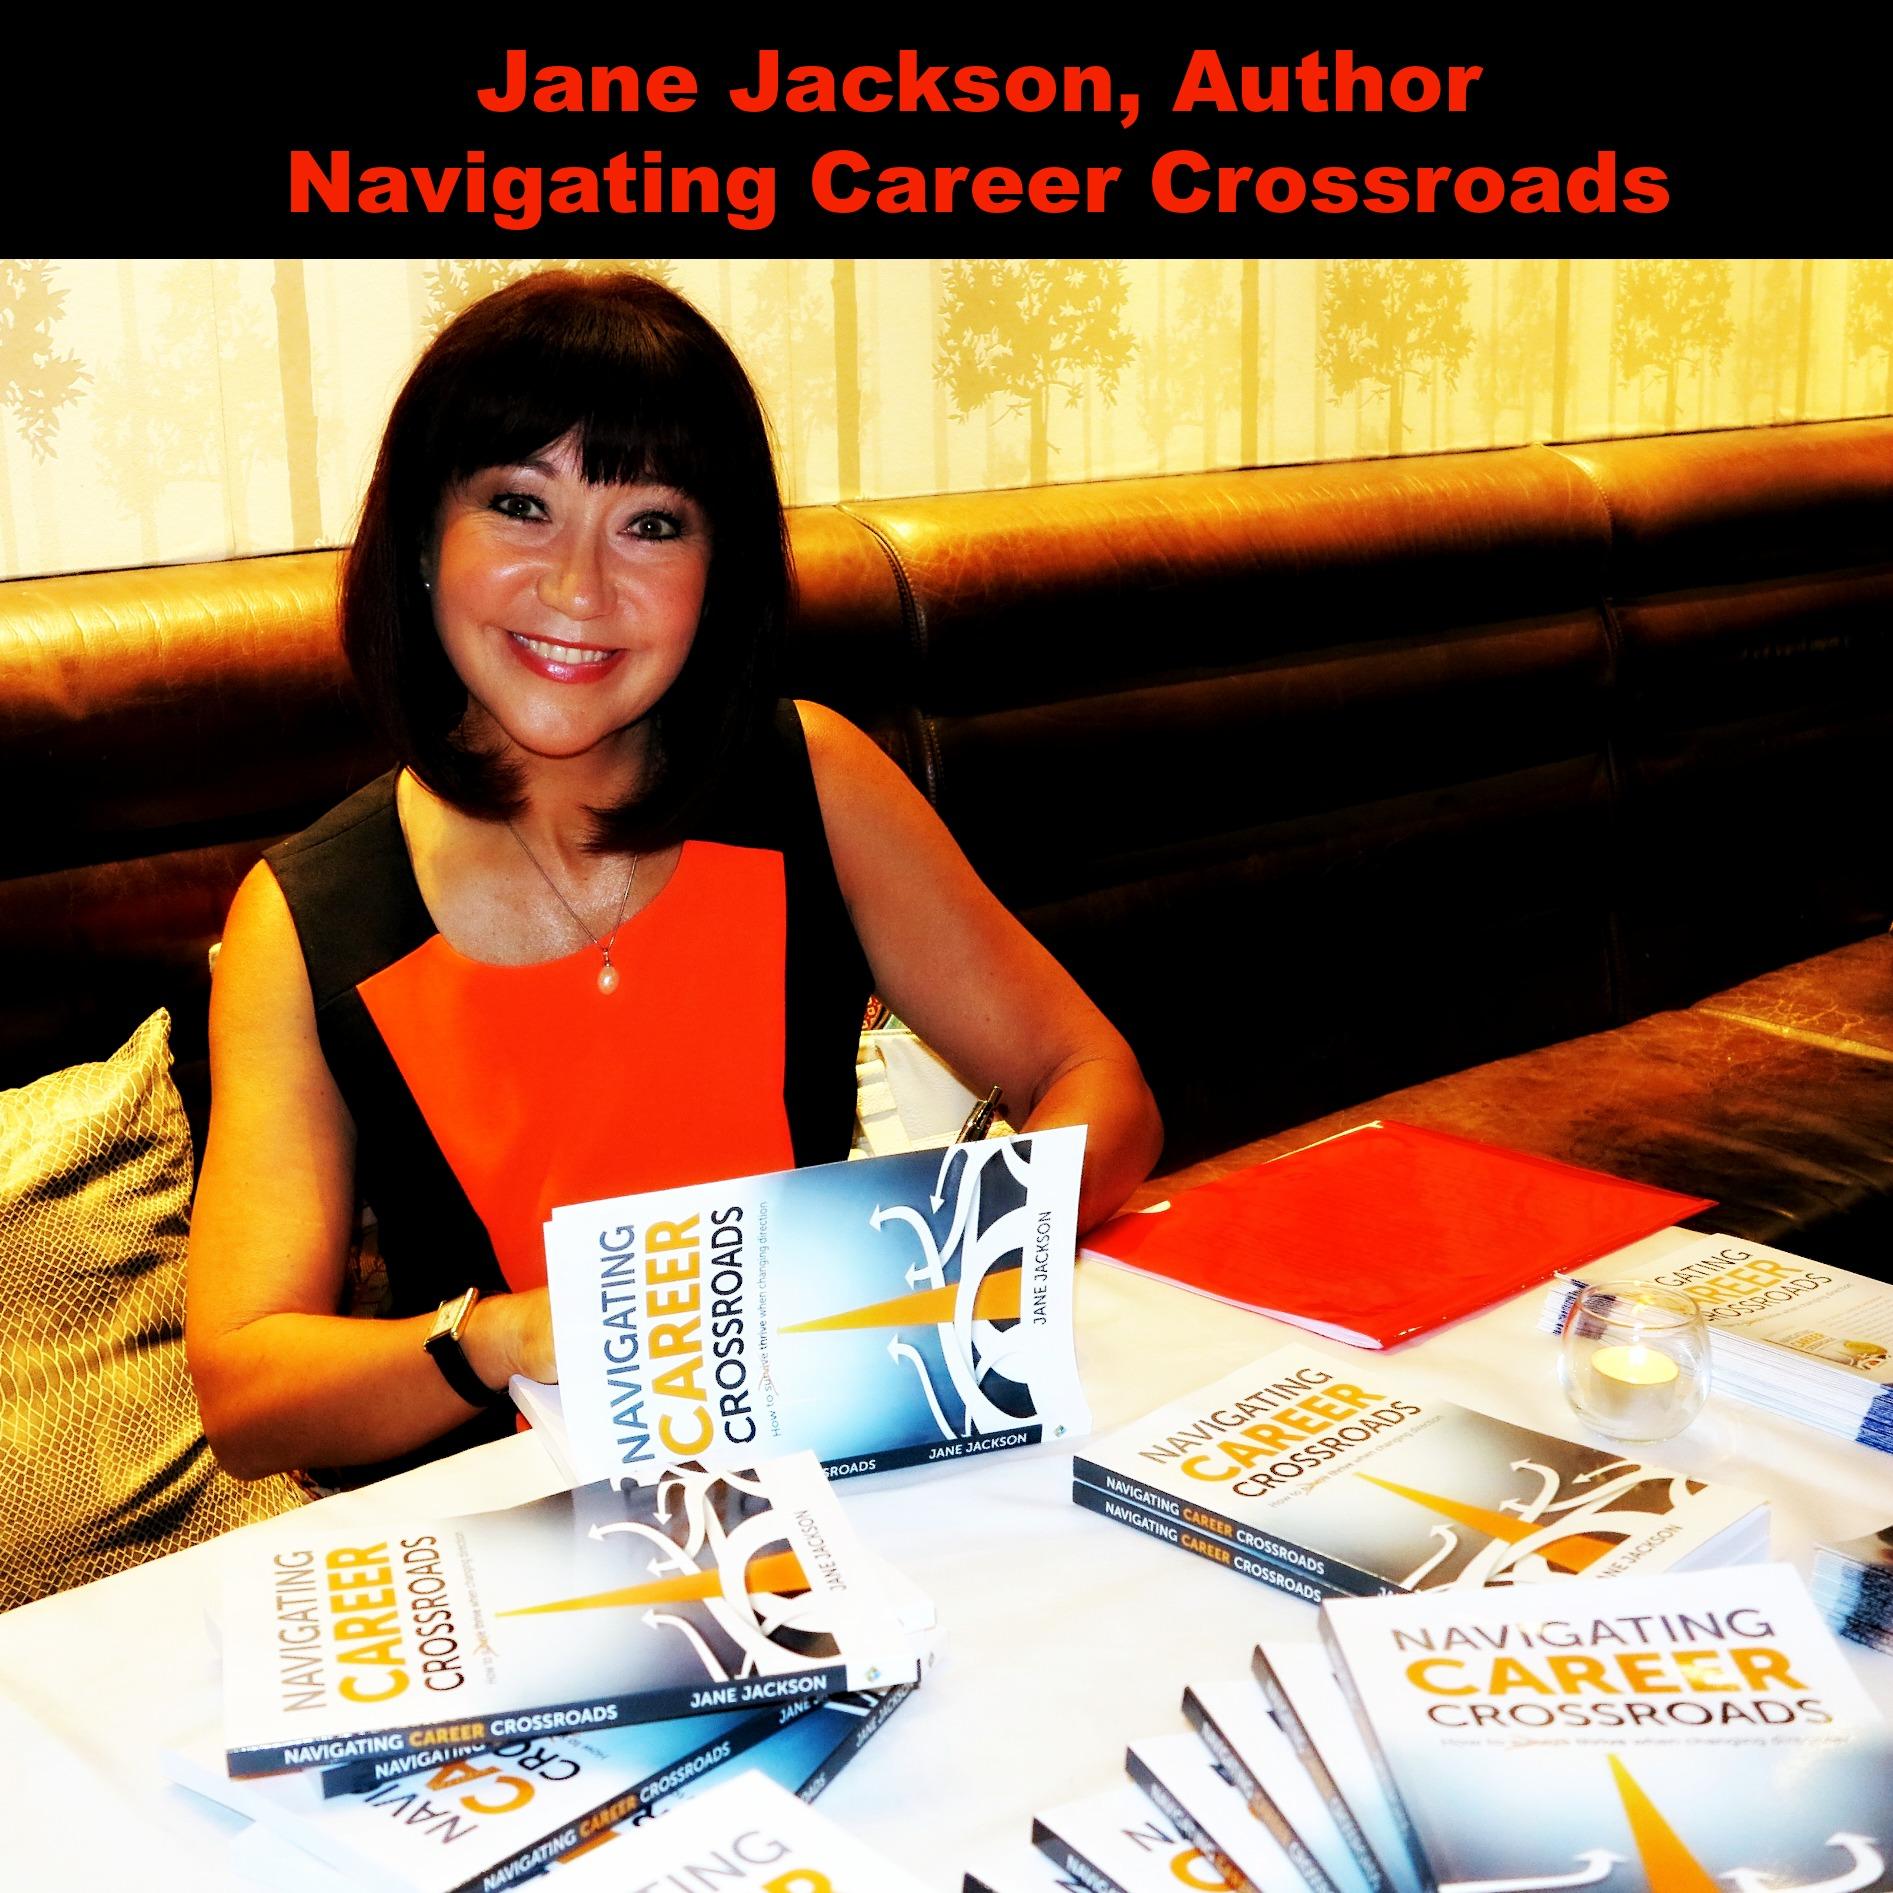 book launch, navigating career crossroads, jane jackson, career, crossroads,